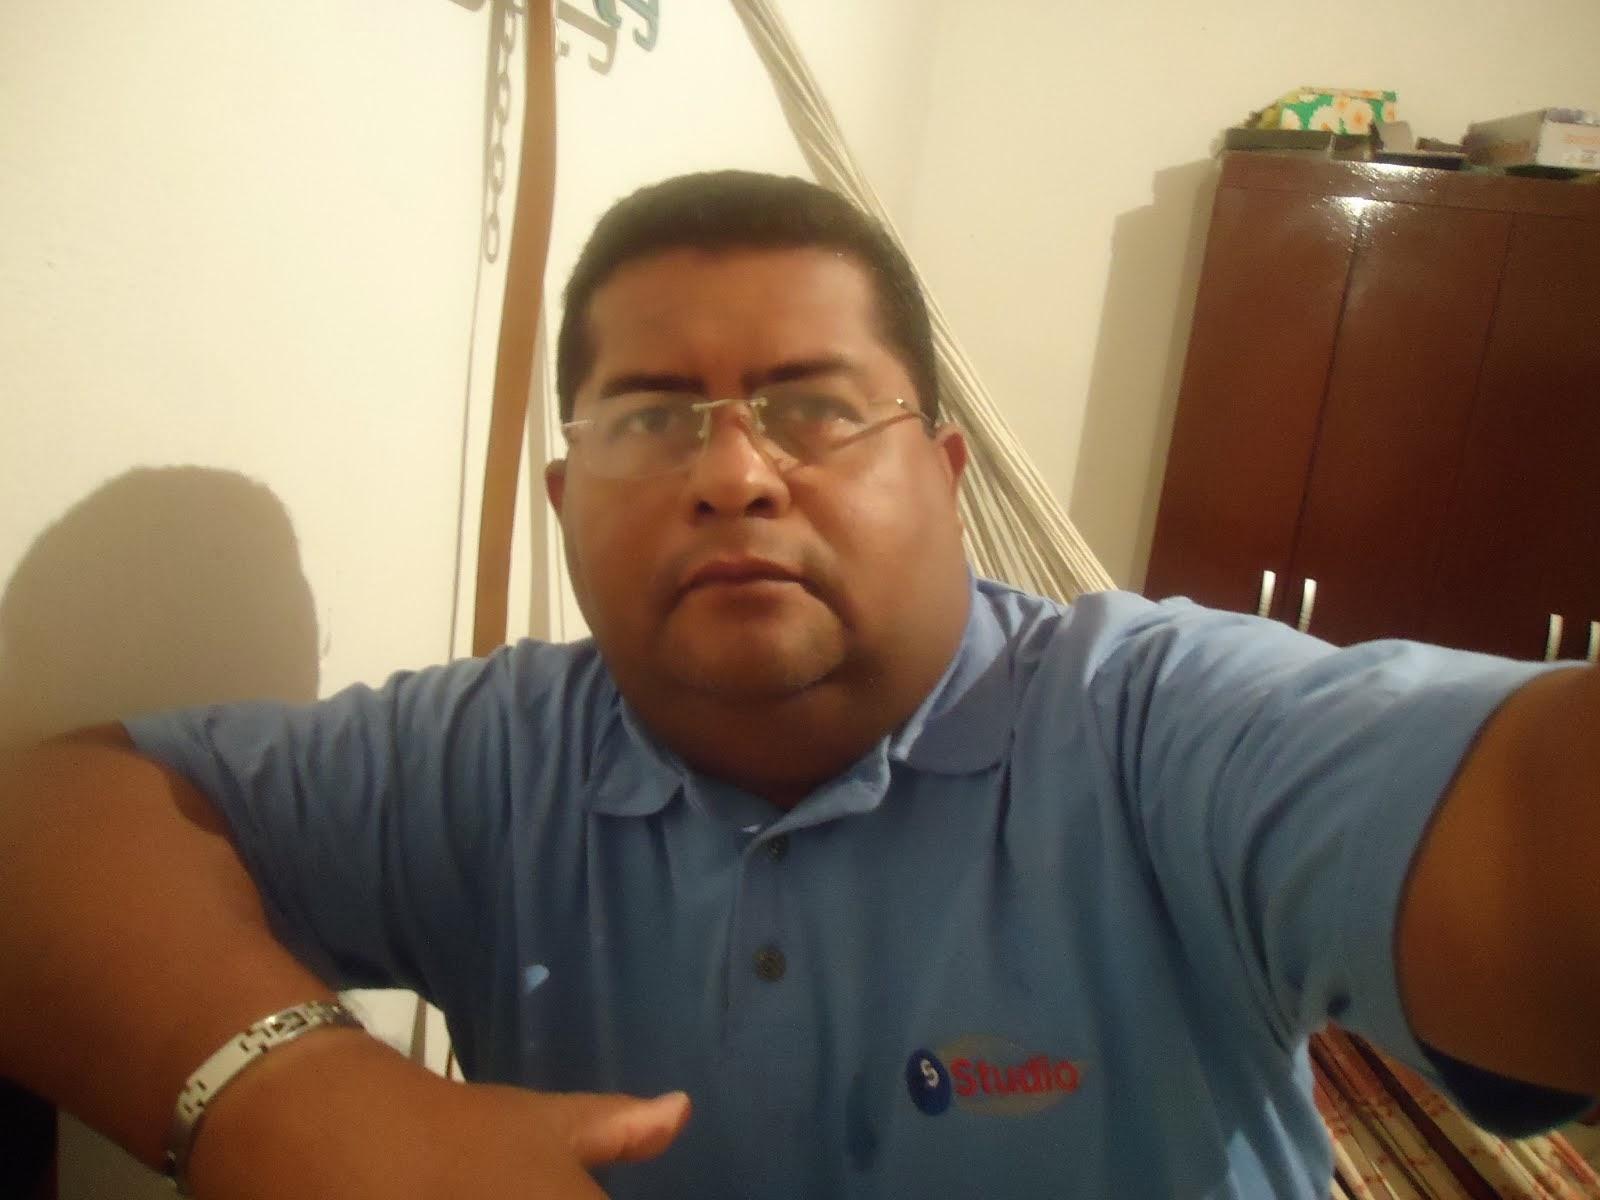 Sueldo Andrade